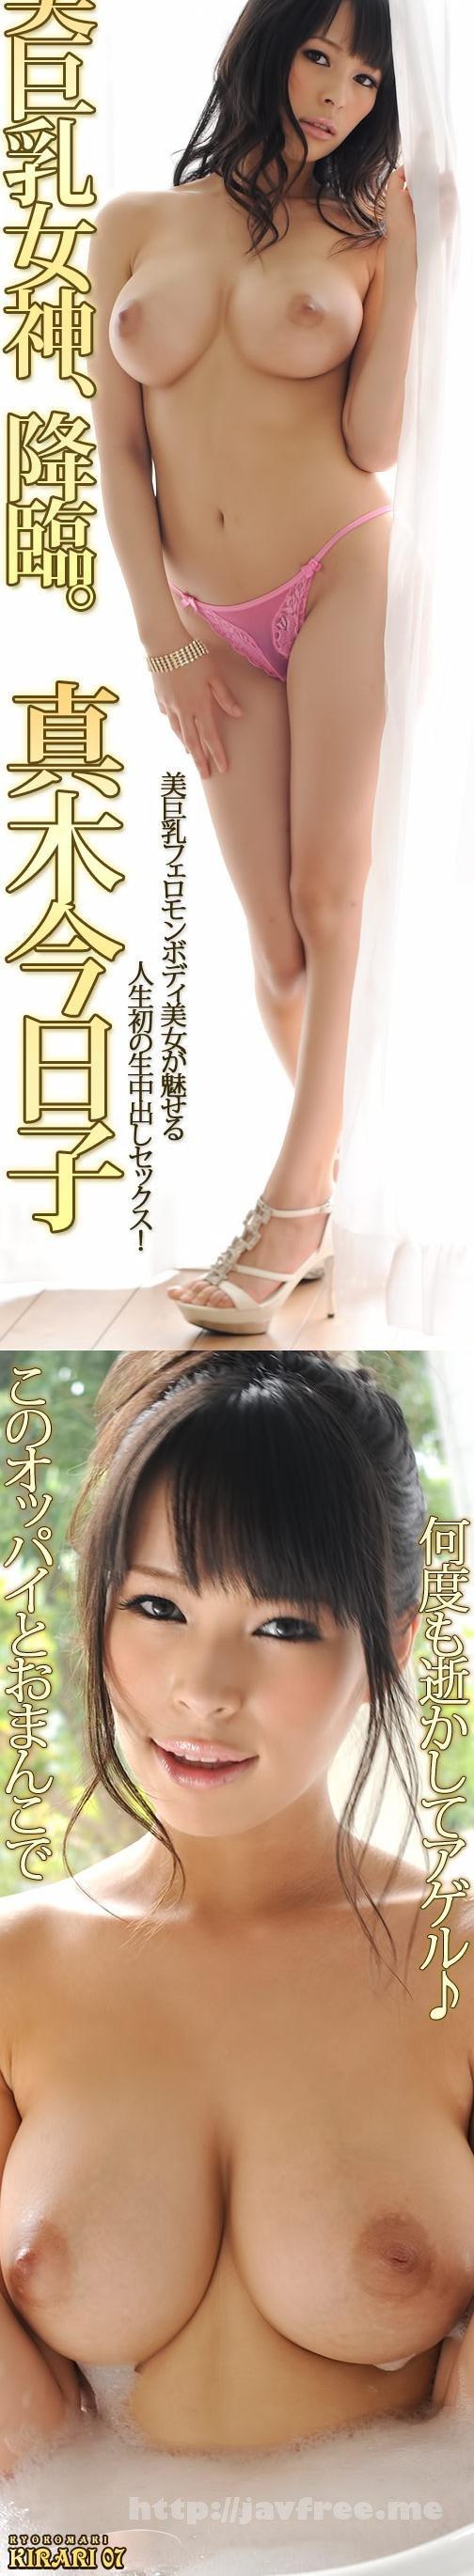 [MKBD-S07][MKD-S07] KIRARI 07 : Kyouko Maki - image MKBD-S07_4 on https://javfree.me